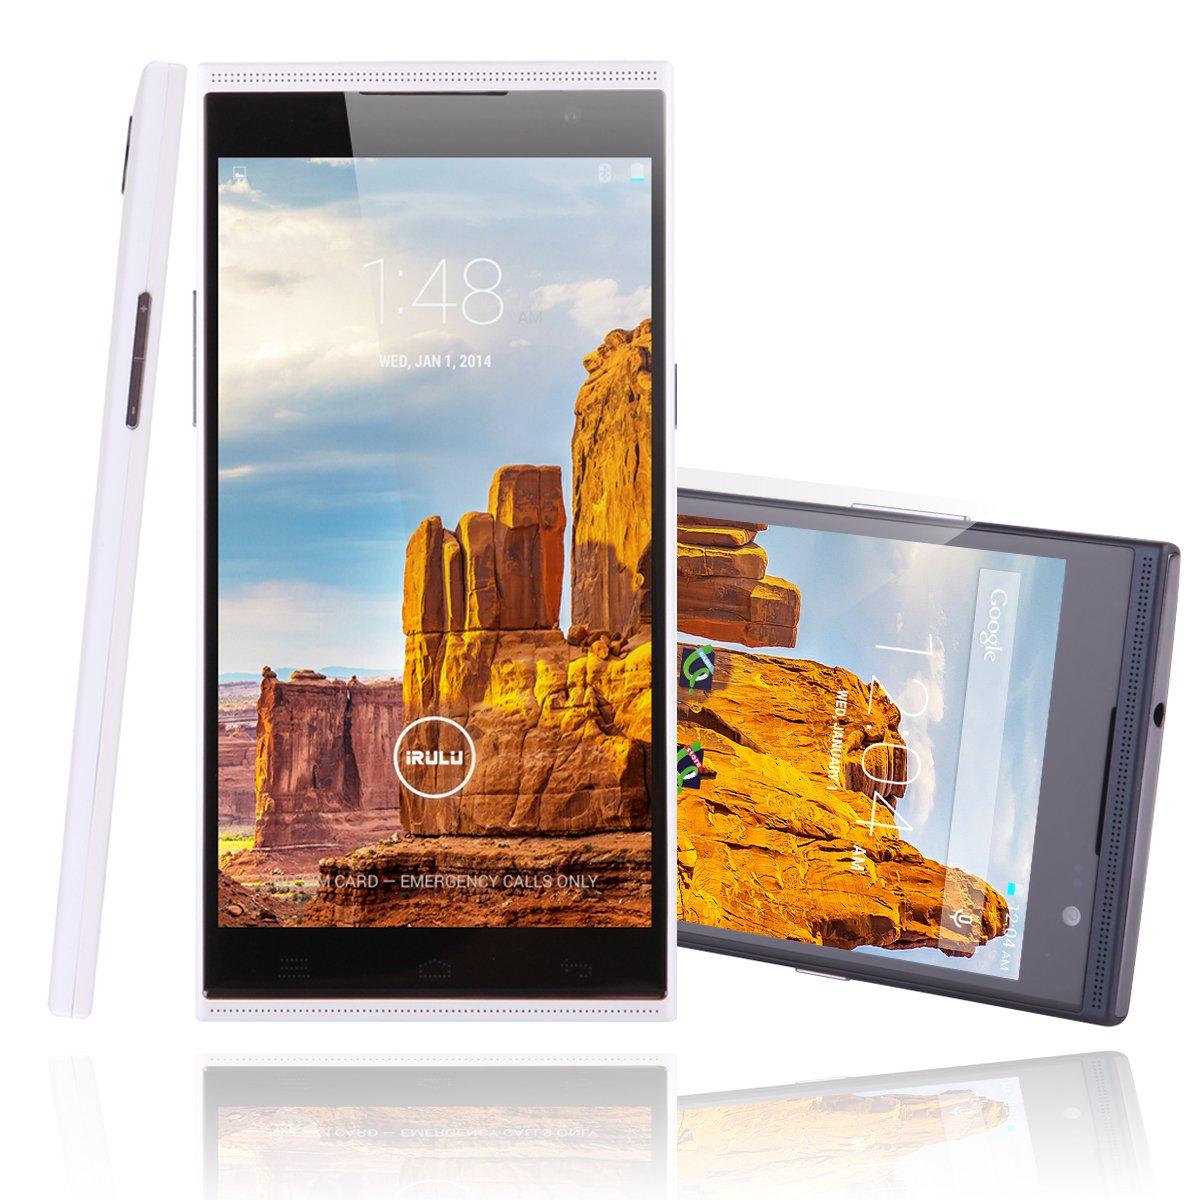 iRulu Newest V1 Phone Ultra Lightweight Android Smartphone